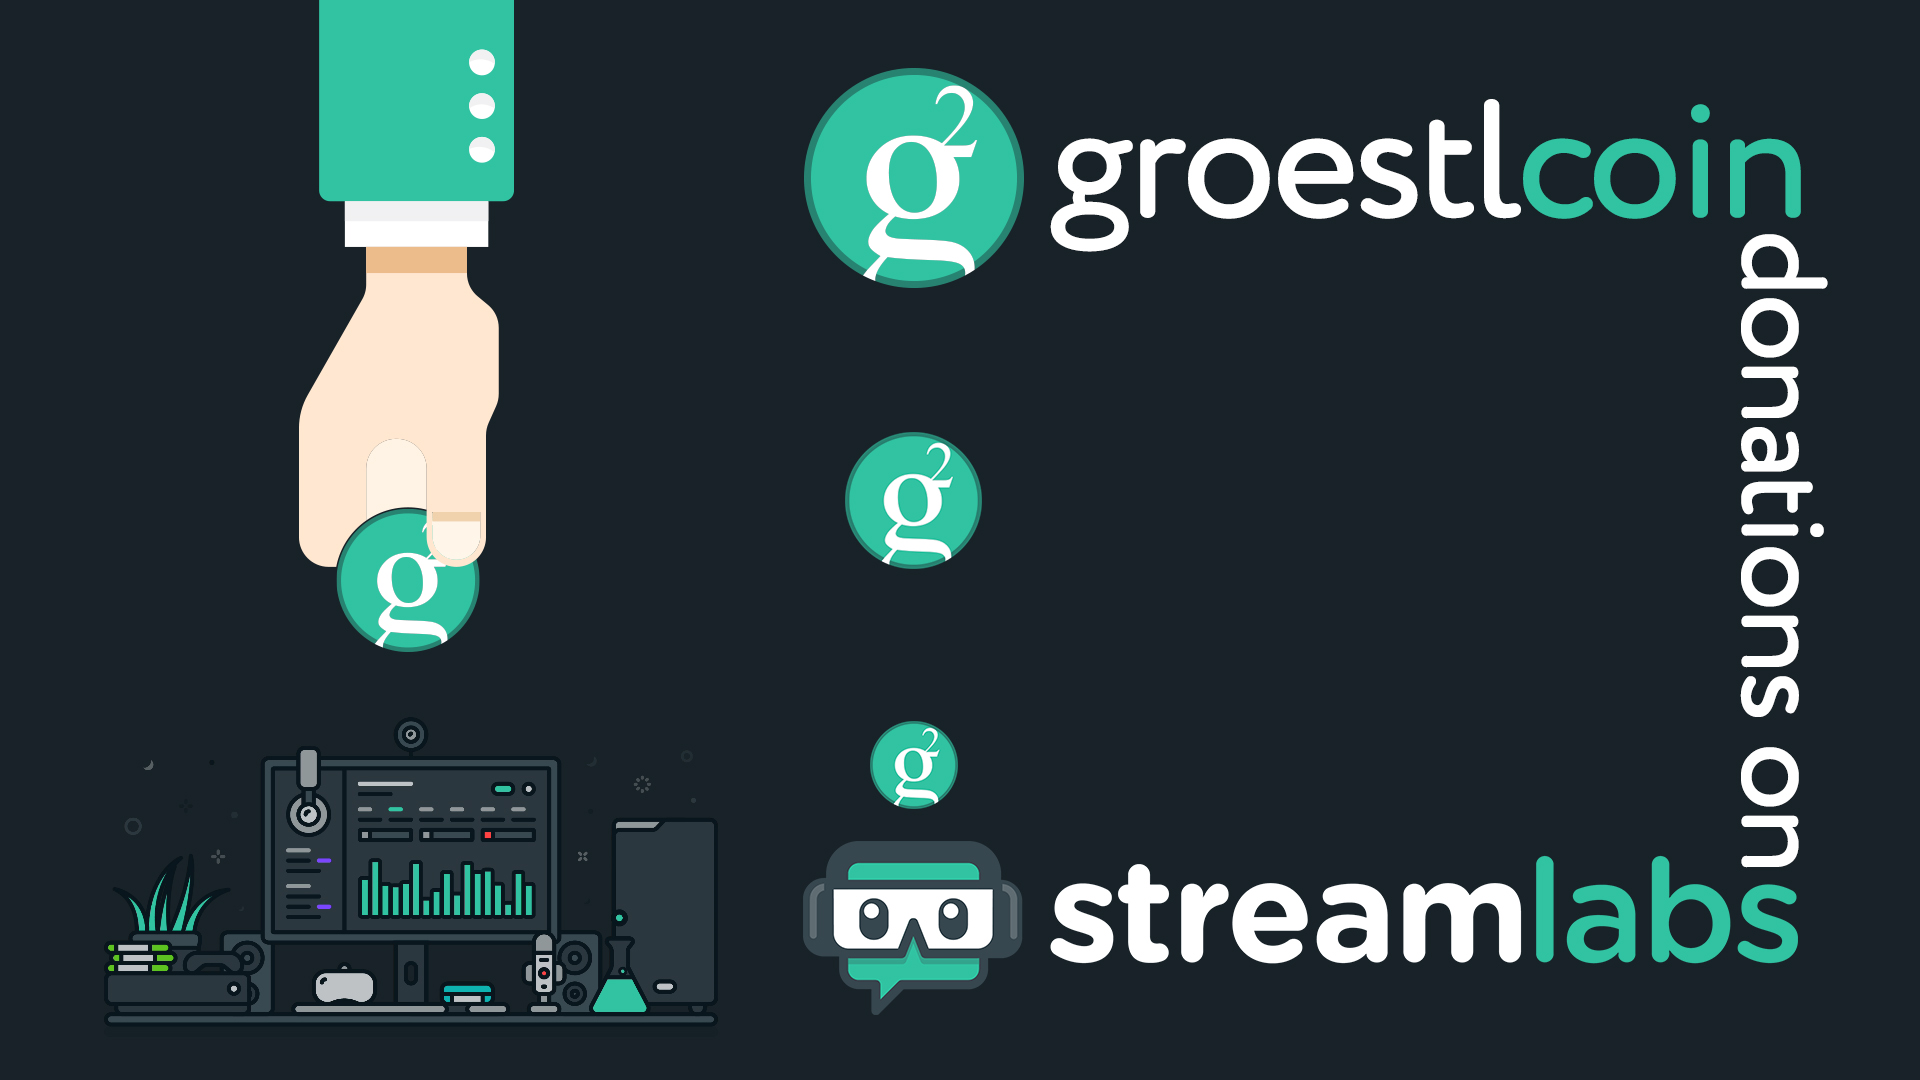 GroestlTip – Groestlcoin on StreamLabs • Groestlcoin (GRS)